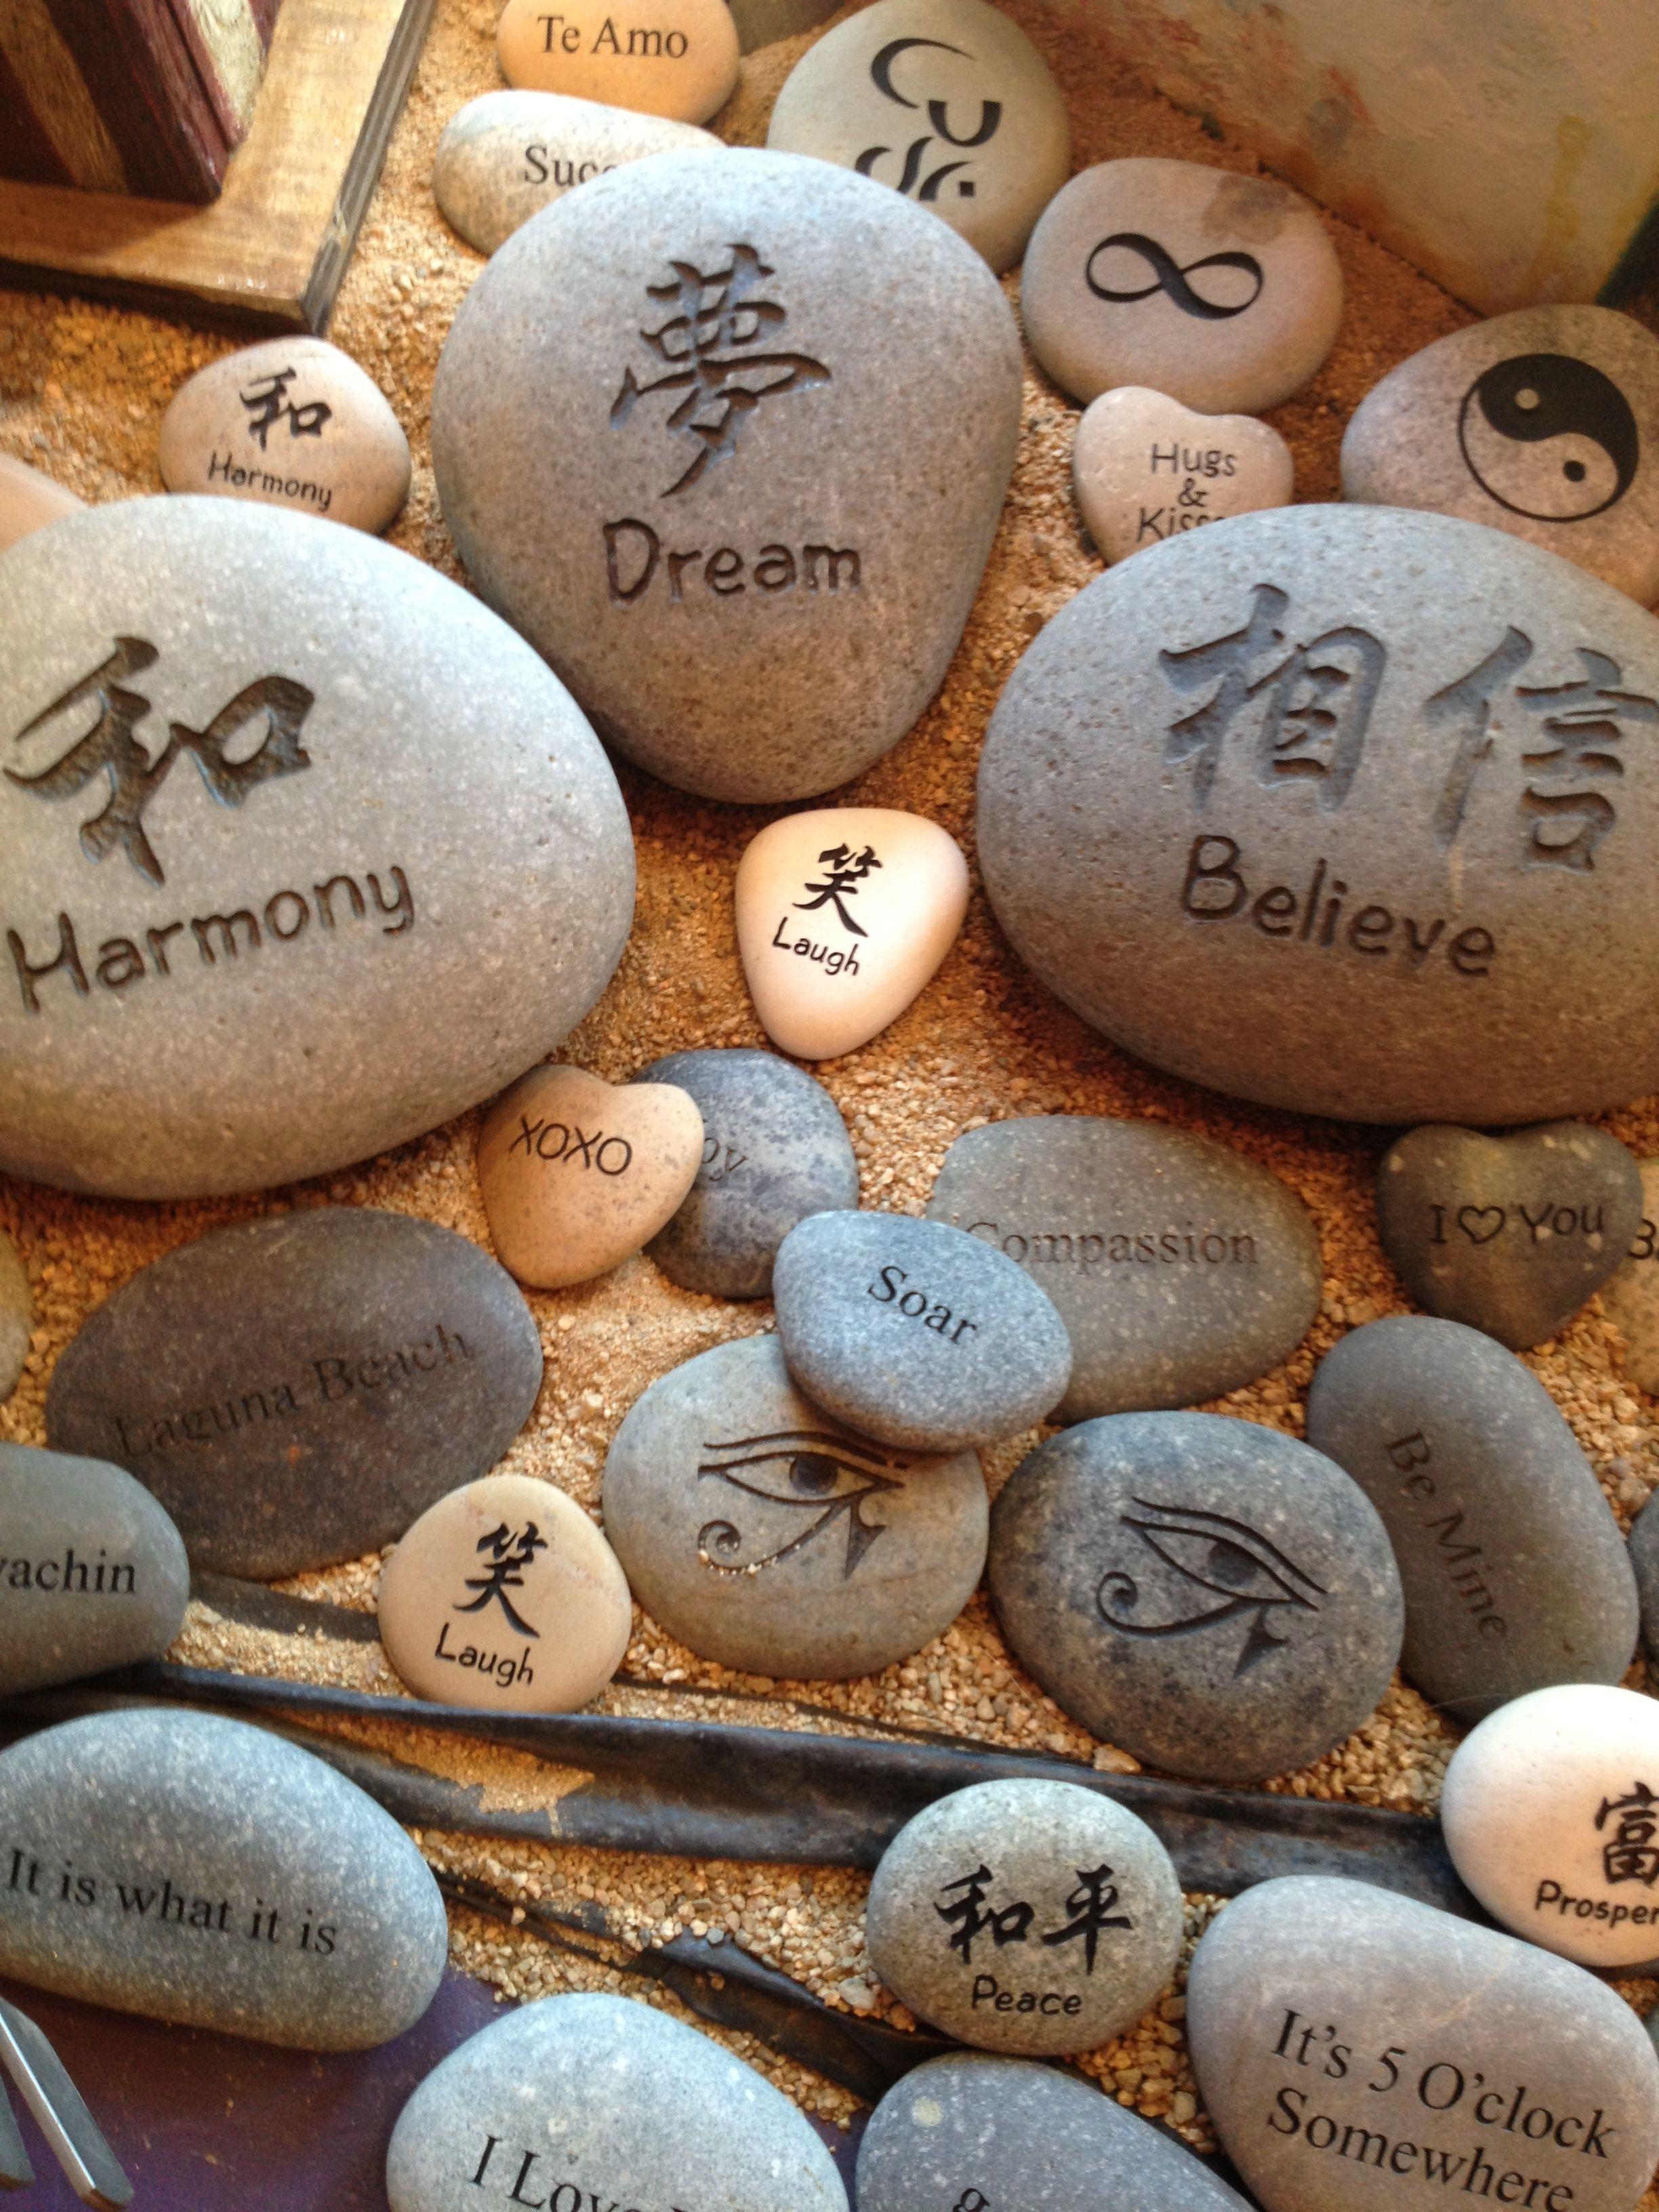 Inspirational stones.